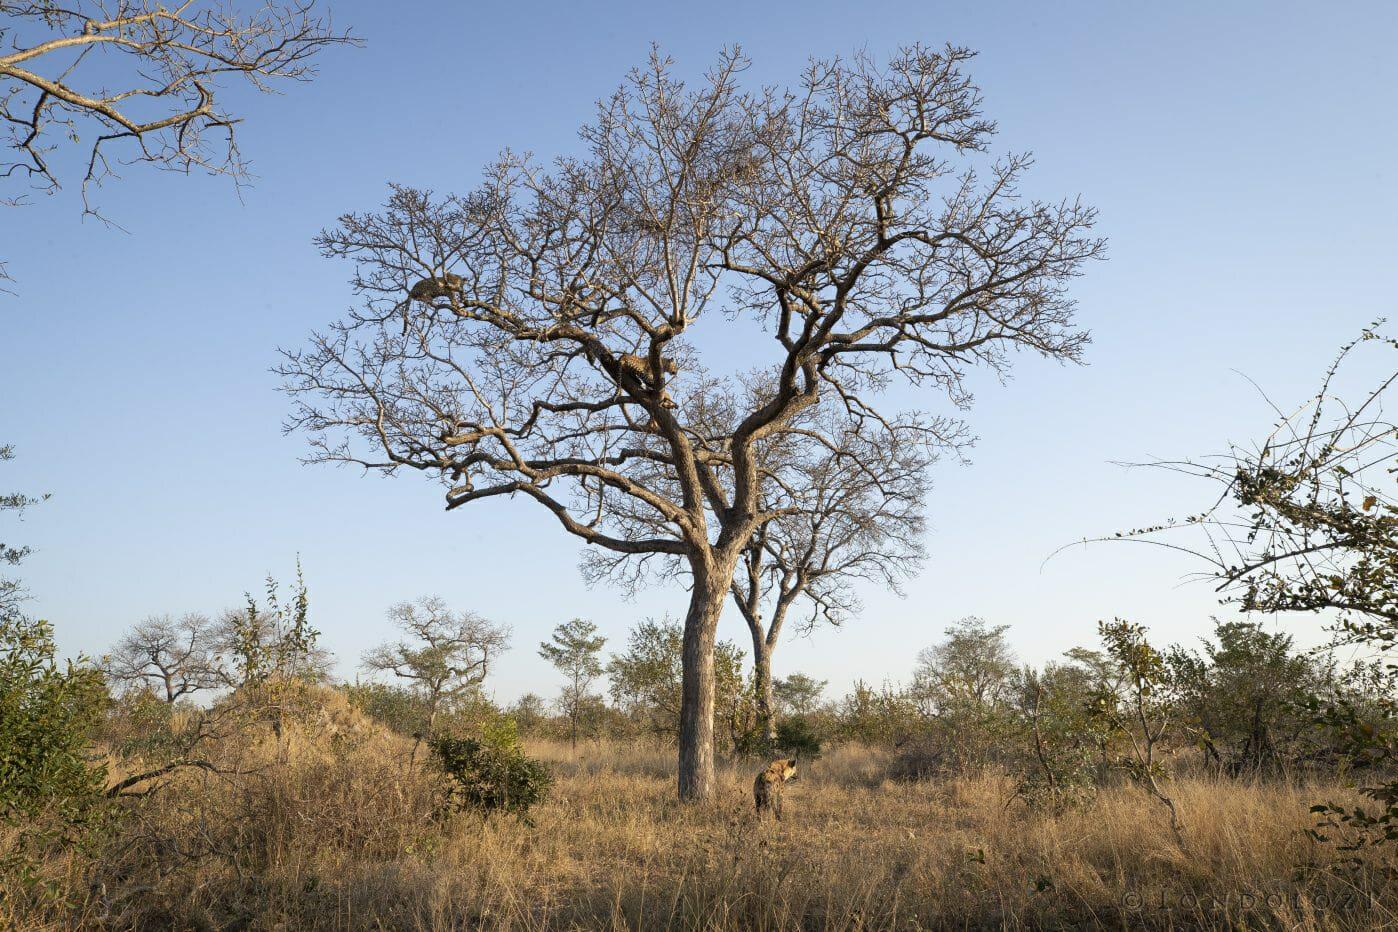 Two Leopards Marula Tree